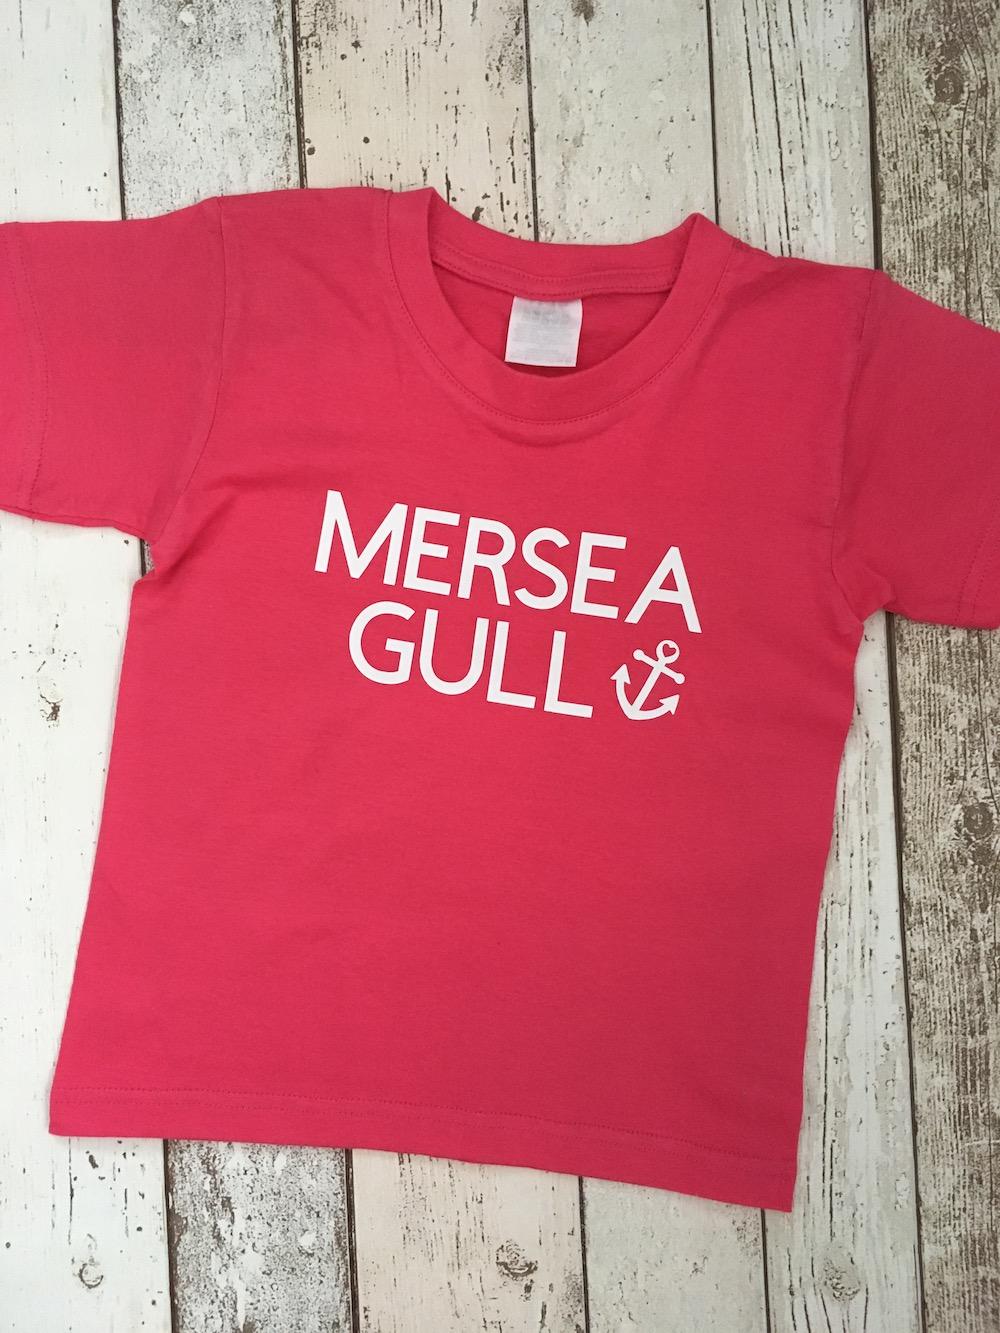 Mersea Gull Tshirt